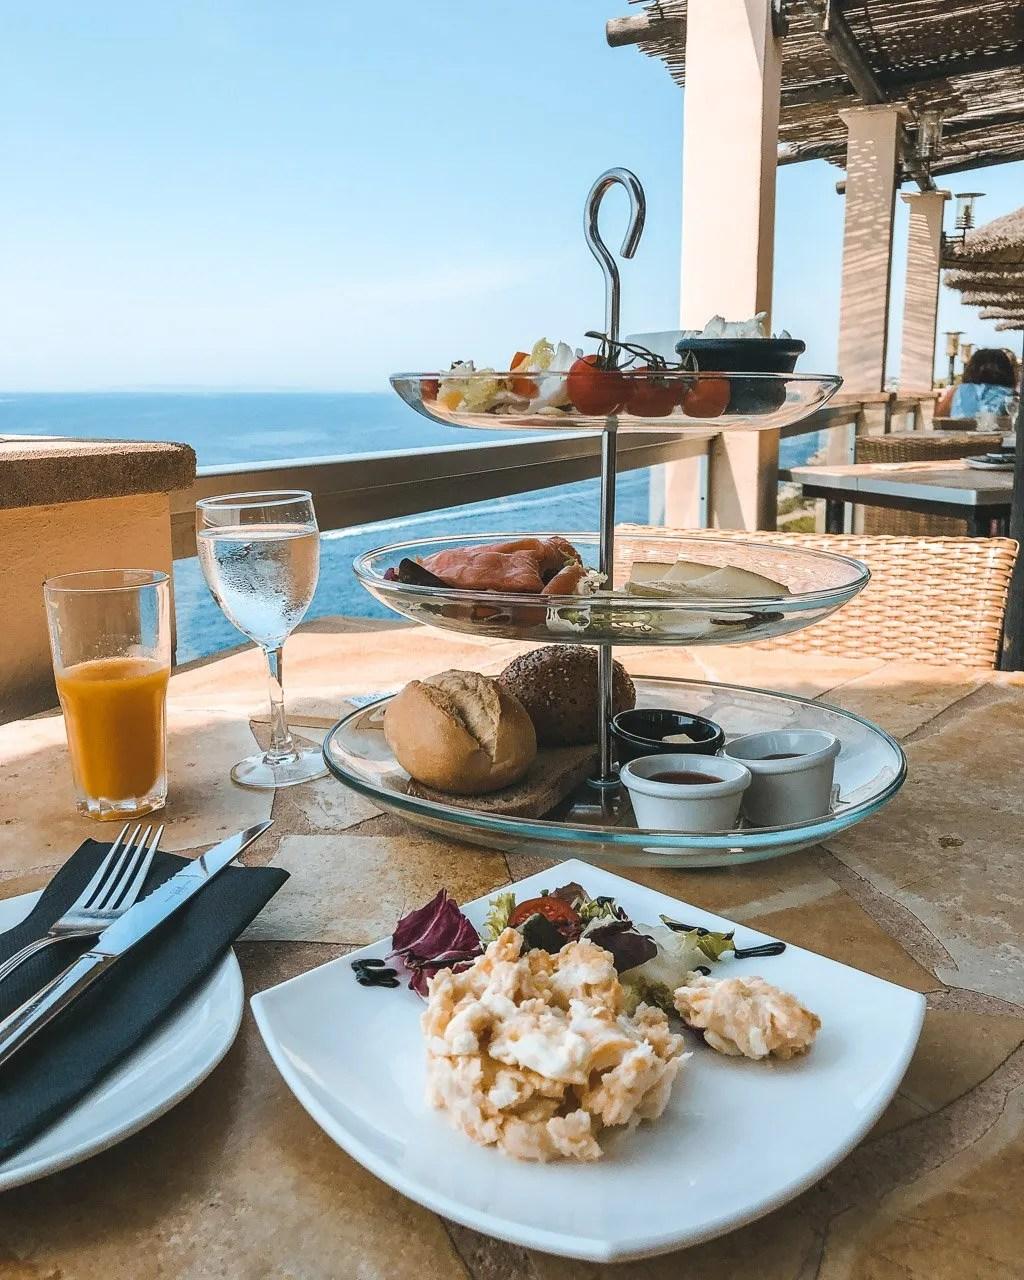 Best mallorca restaurants, Romantic restaurants mallorca, best restaurants in mallorca, Restaurant Pura Vida Mallorca, restaurant Cala Figuera, Mallorca restaurant, Mallorca restaurants with a view, Palma restaurants with a view